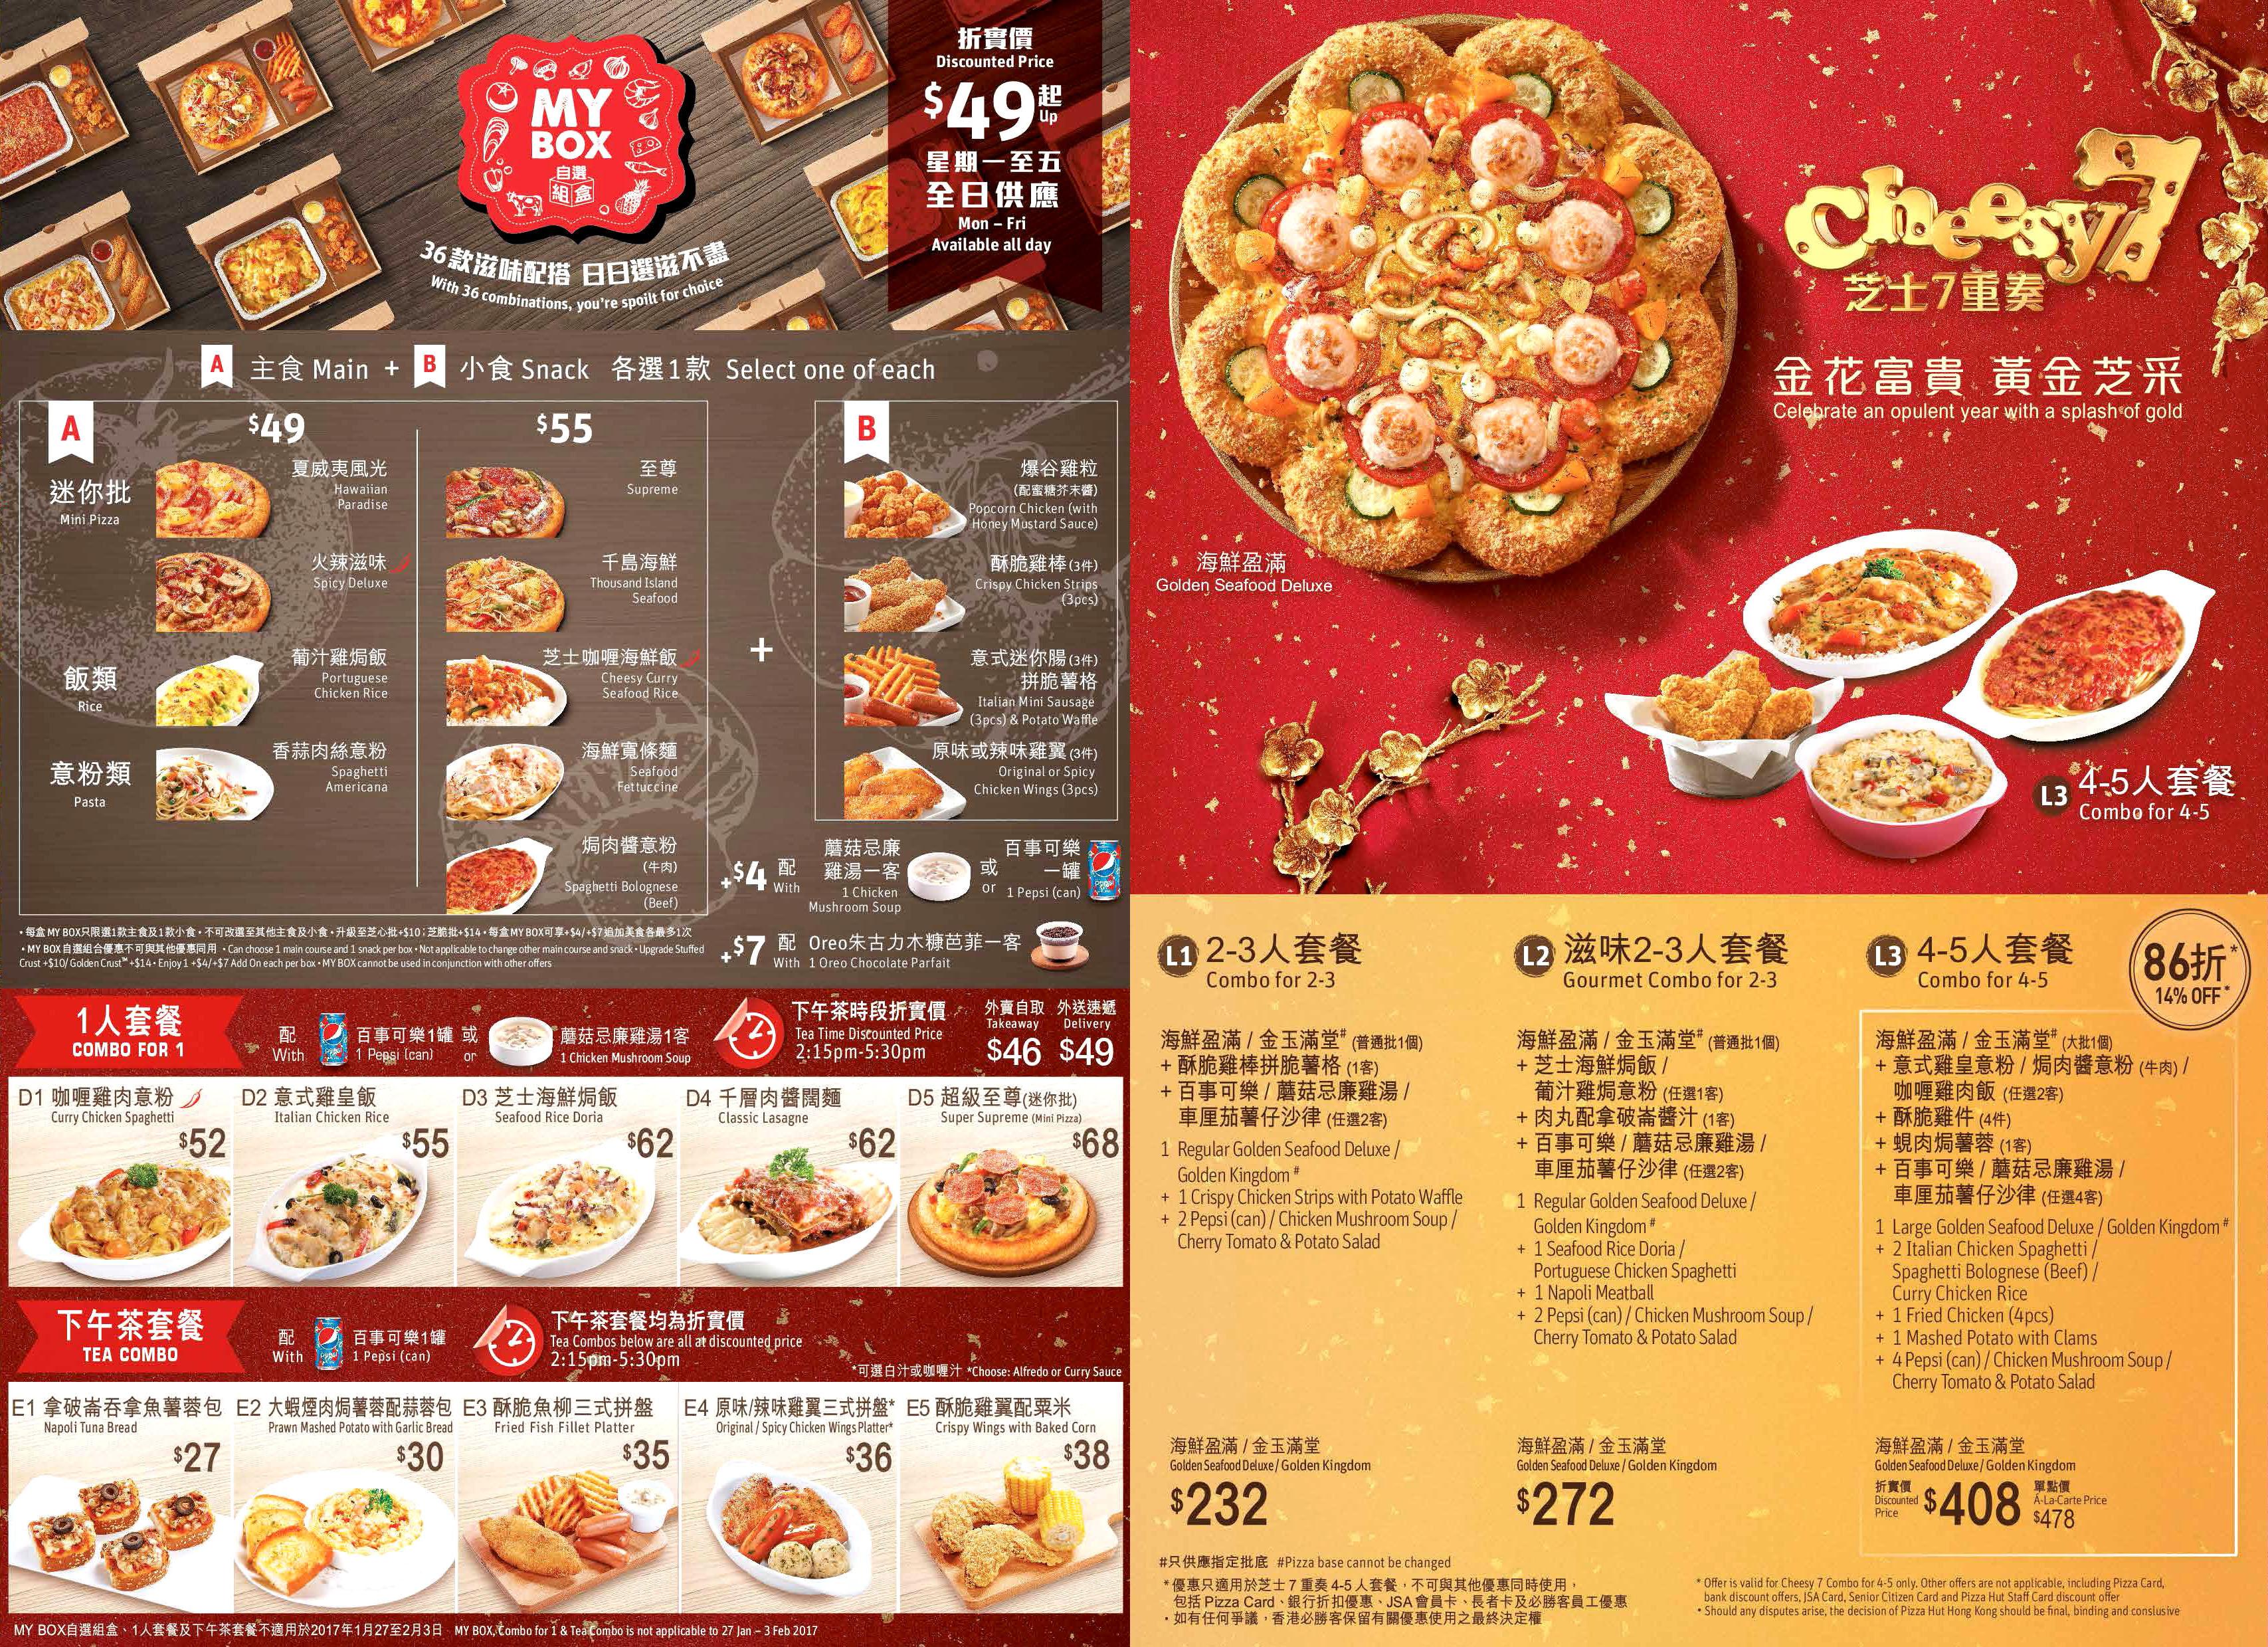 Pizza hut menu coupons codes